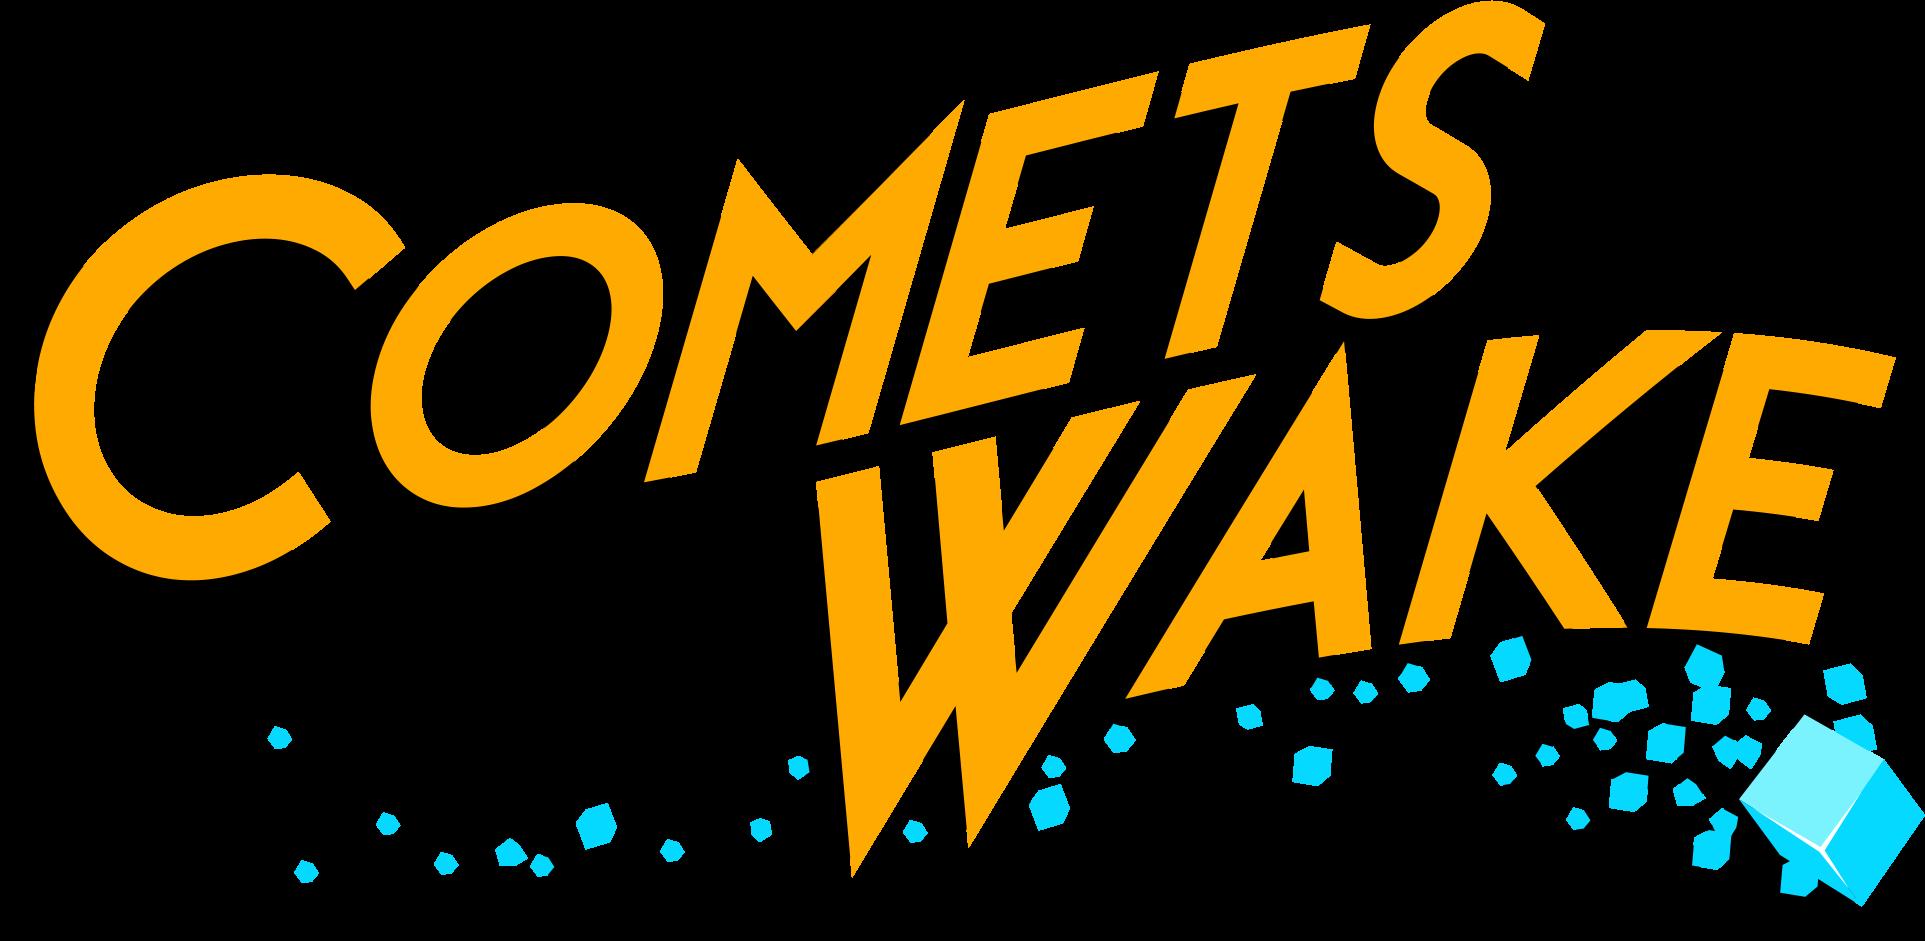 CometsWake_alpha.png